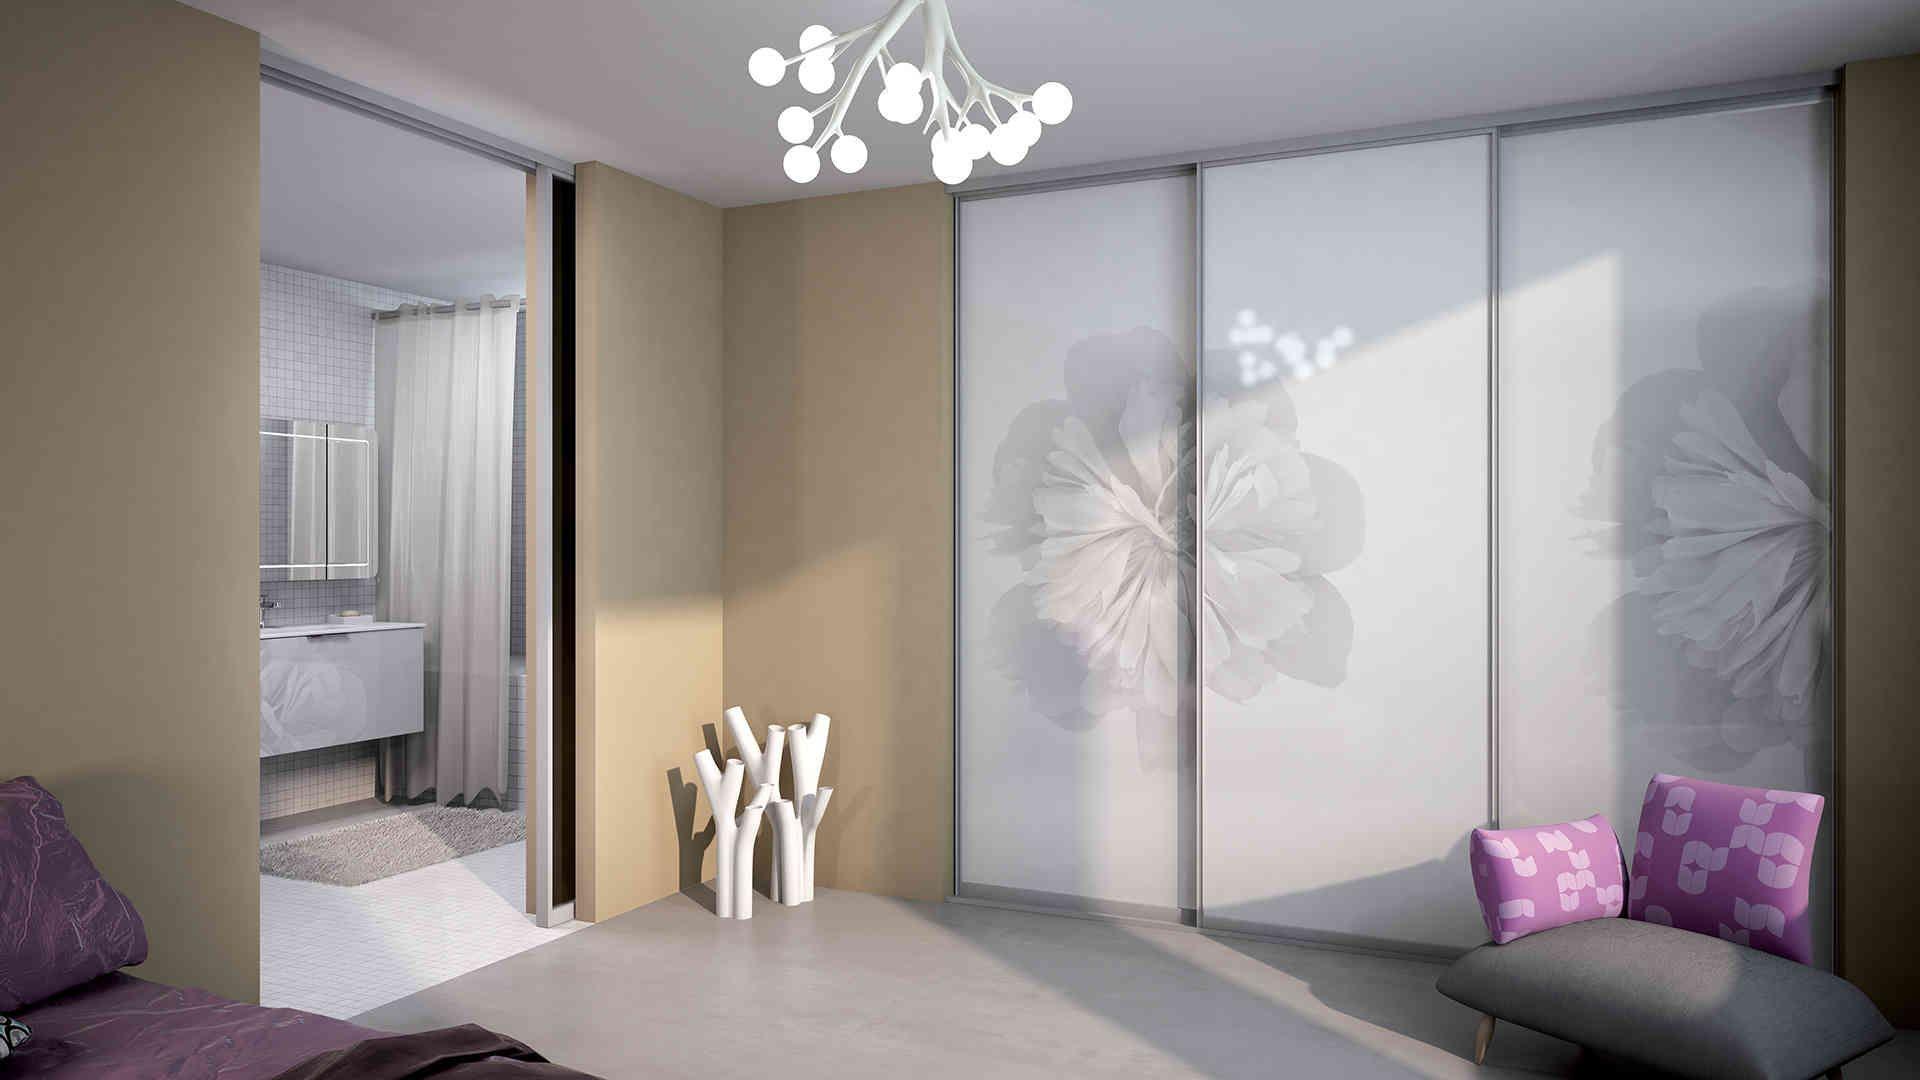 Avis Meuble Salle De Bain Cuisinella ~ salle de bain cuisinella avis beau salle de bain cuisinella avec